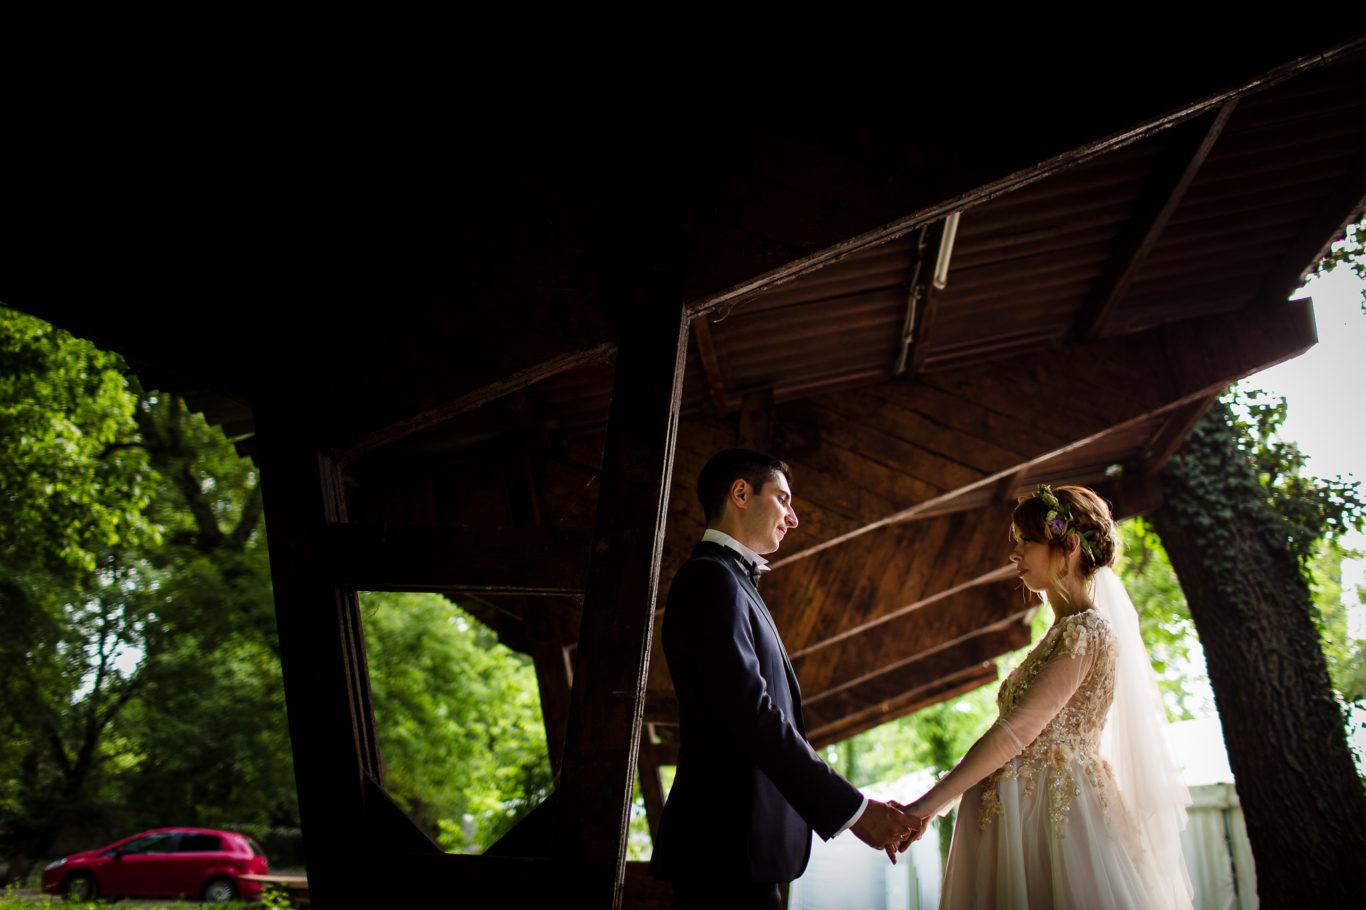 0174-Fotografie-nunta-Stirbey-Laura-Rares-fotograf-Ciprian-Dumitrescu-CDF_0150 (2)